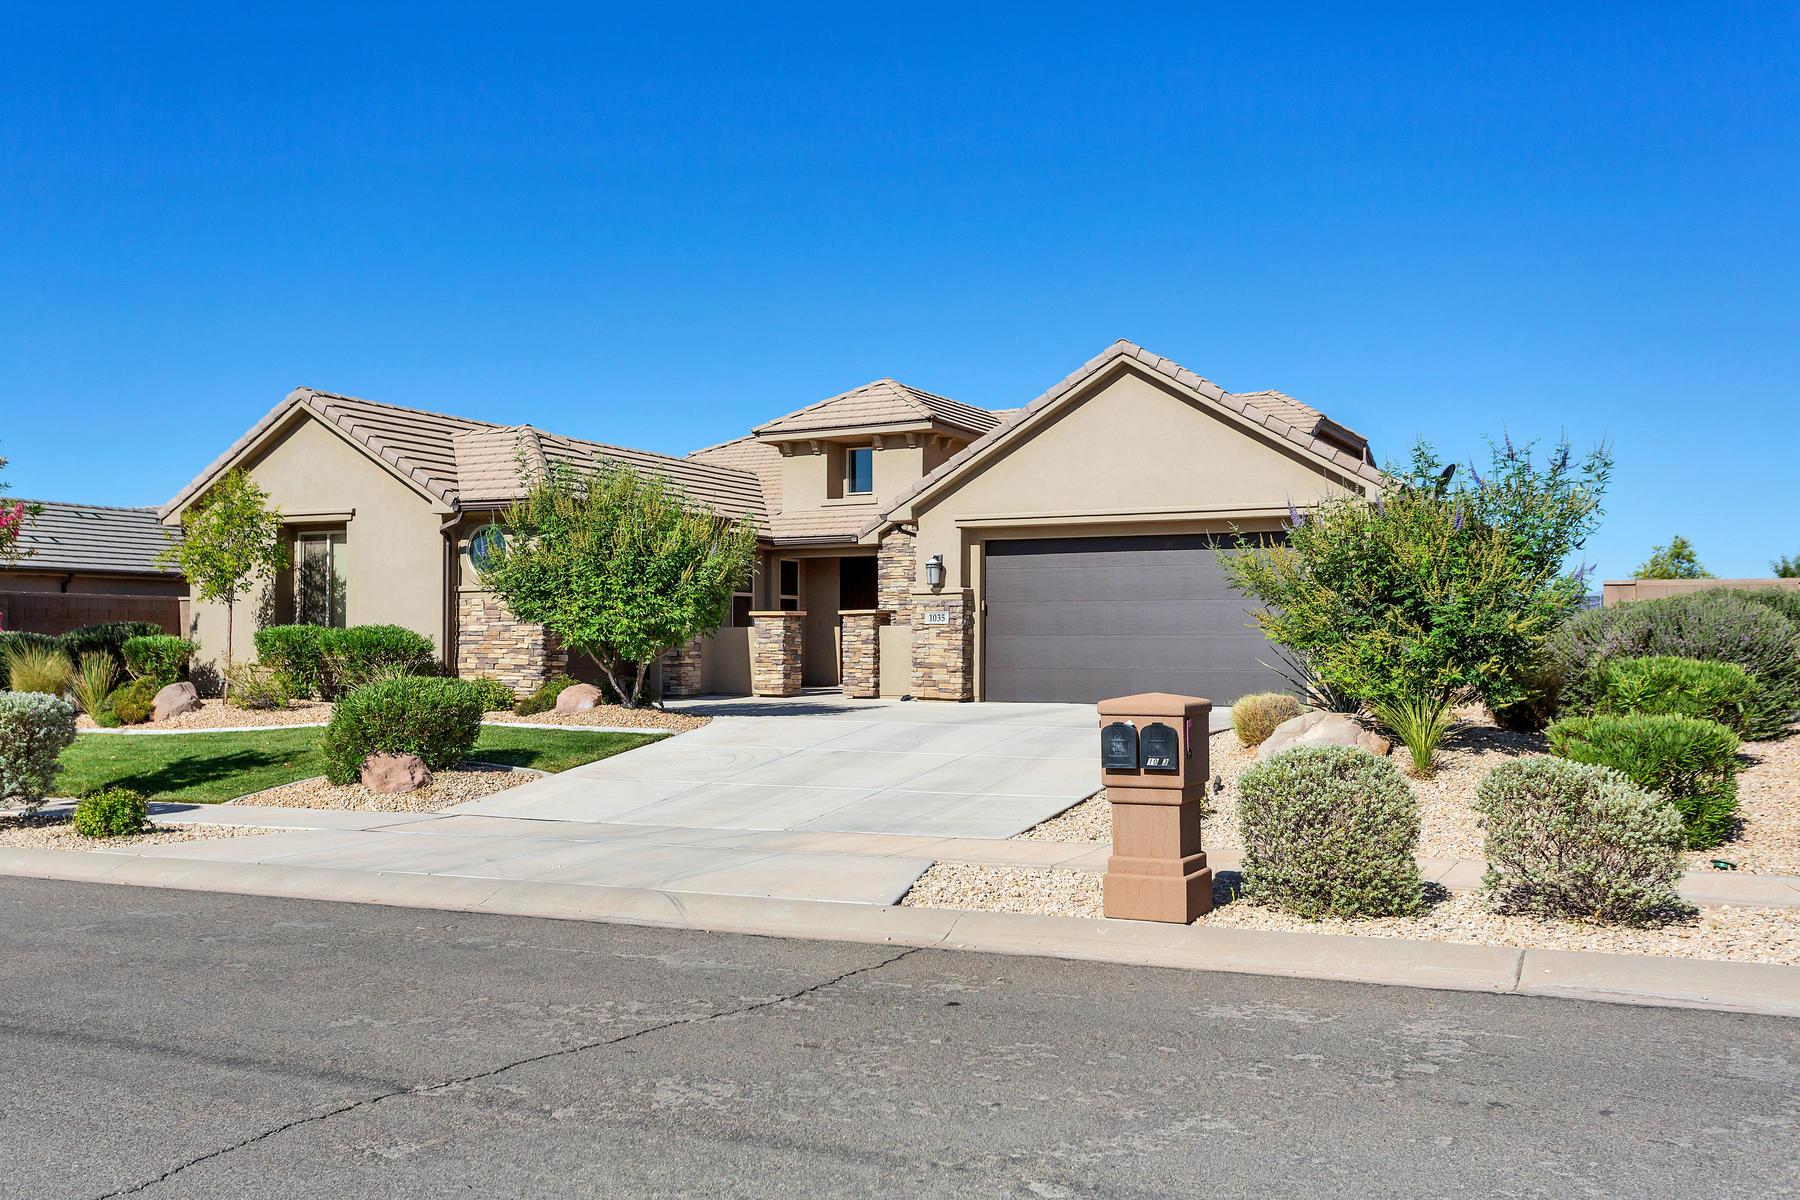 Single Family Homes for Active at Relax At Coral Canyon 1035 N Crown King Ave Washington, Utah 84780 United States